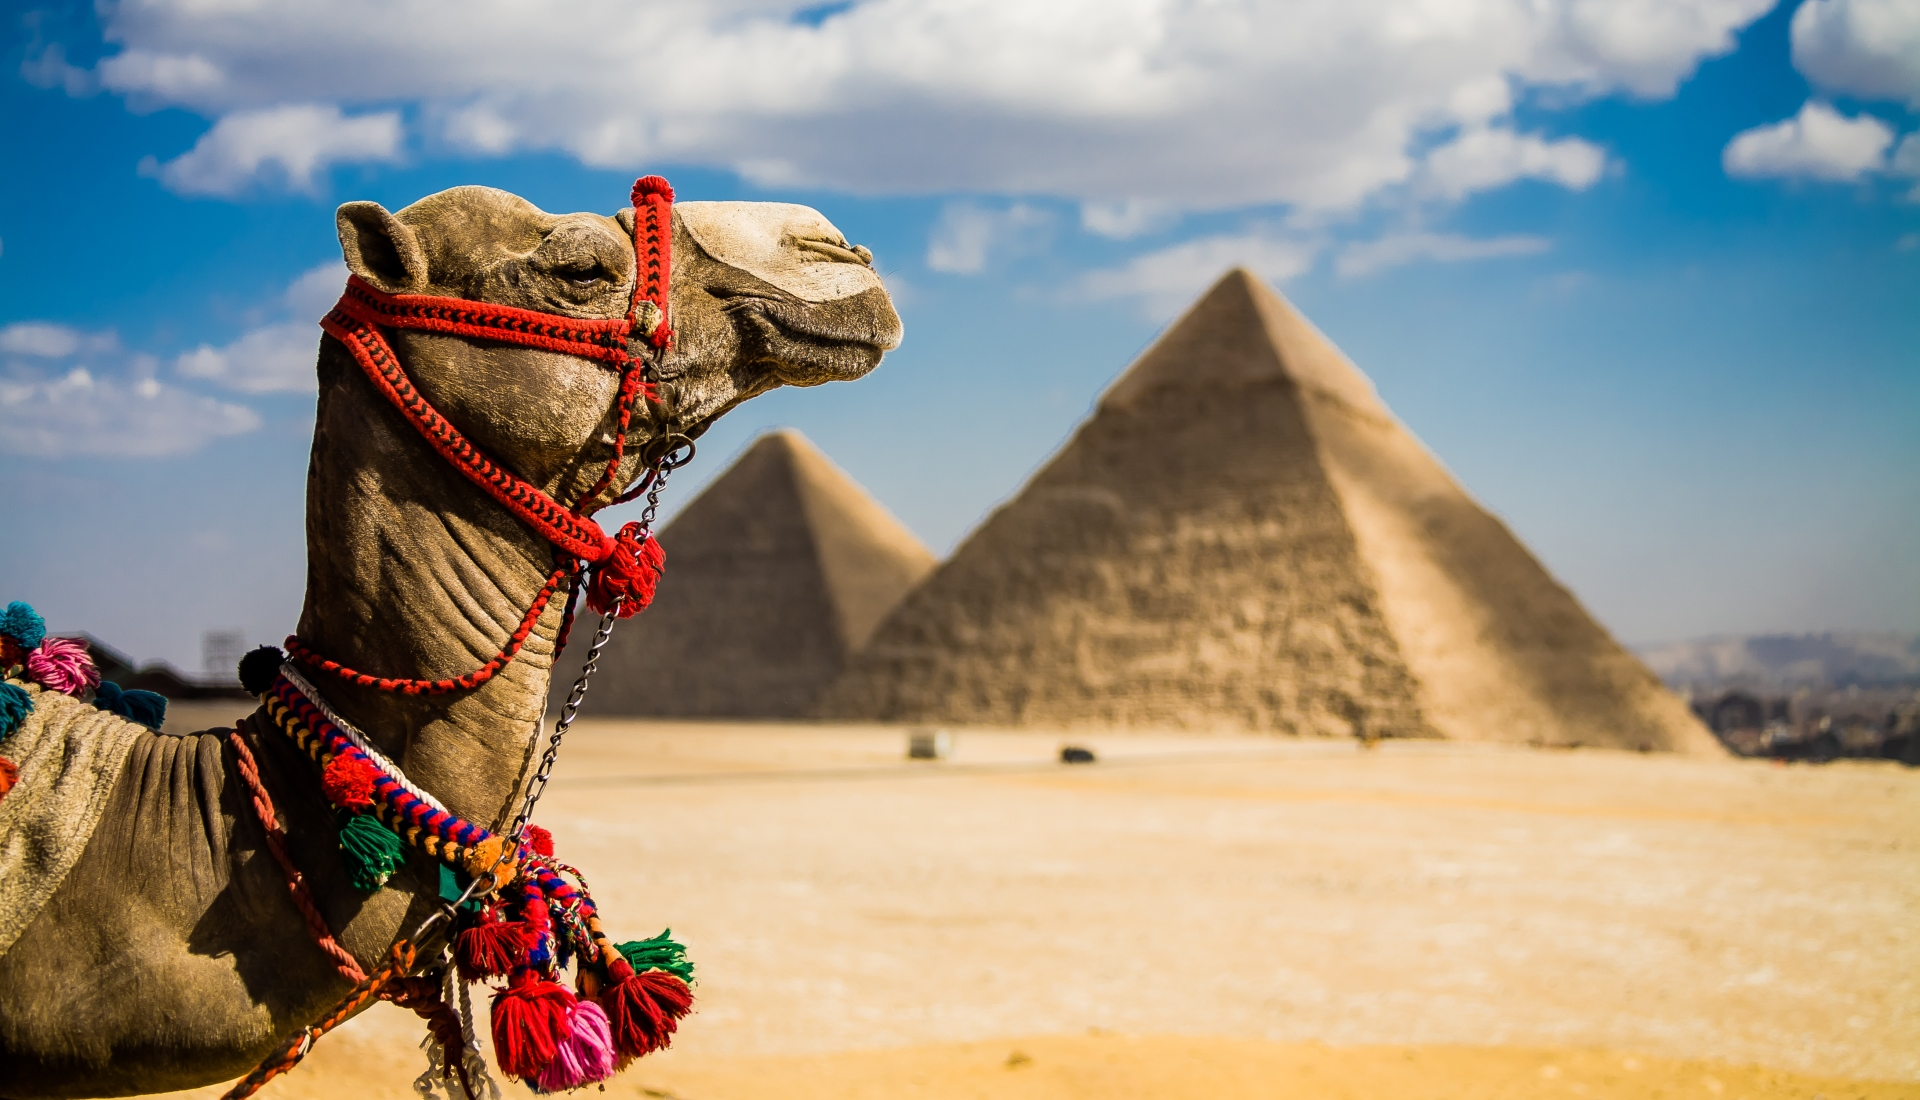 Egipto Mágico - até Abril 2022